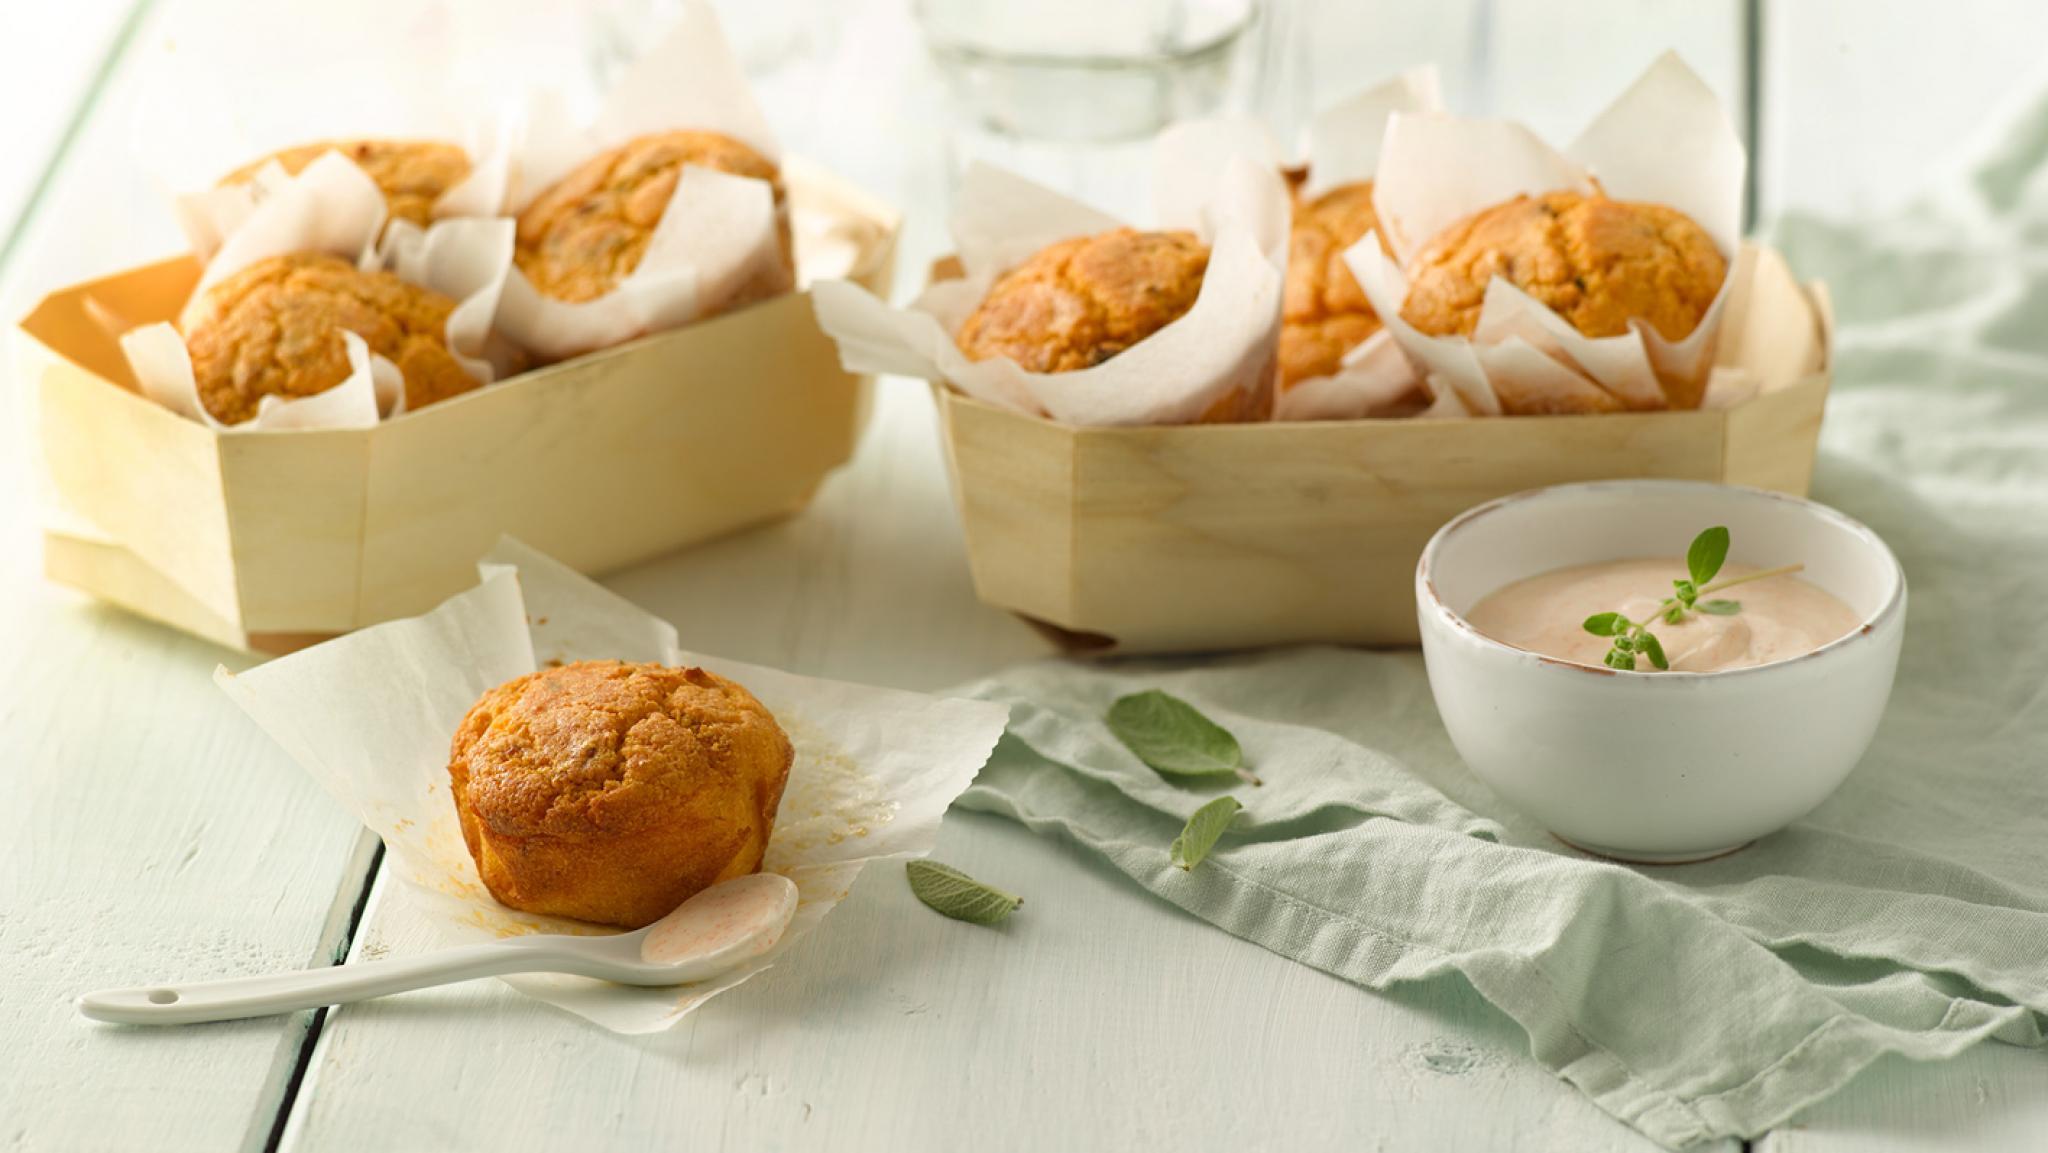 Mais-Paprika-Muffins mit scharfer Joghurtsauce